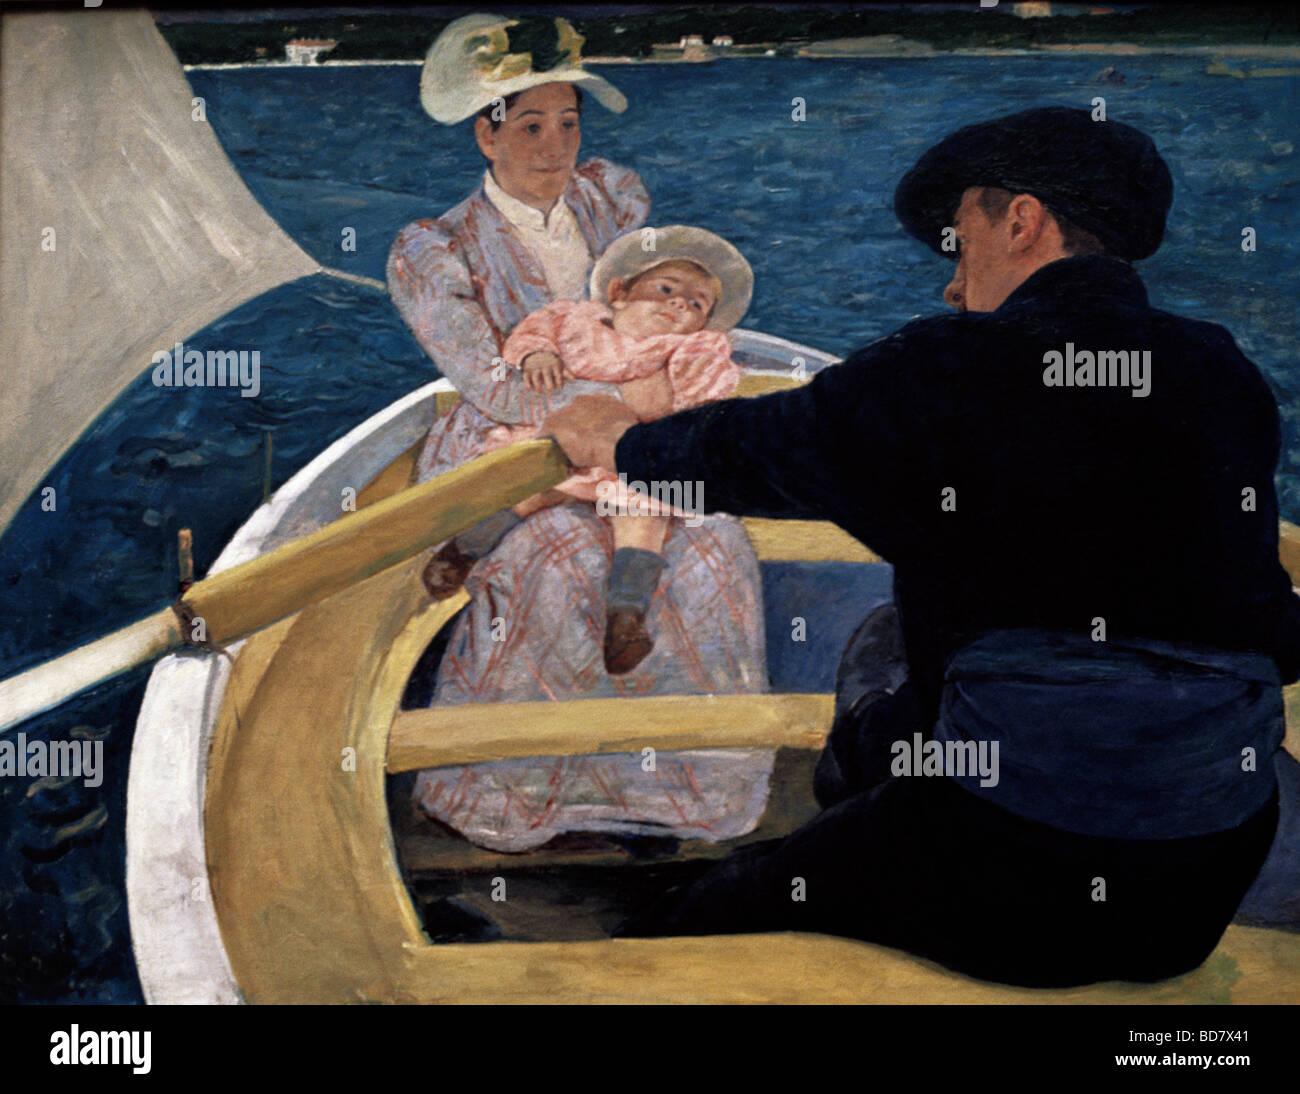 Bellas artes, Mary Cassatt (1844 - 1926), pintura, 'boat trip', aceite de lienzo, 90 x 188 cm, 1893, National Gallery Foto de stock